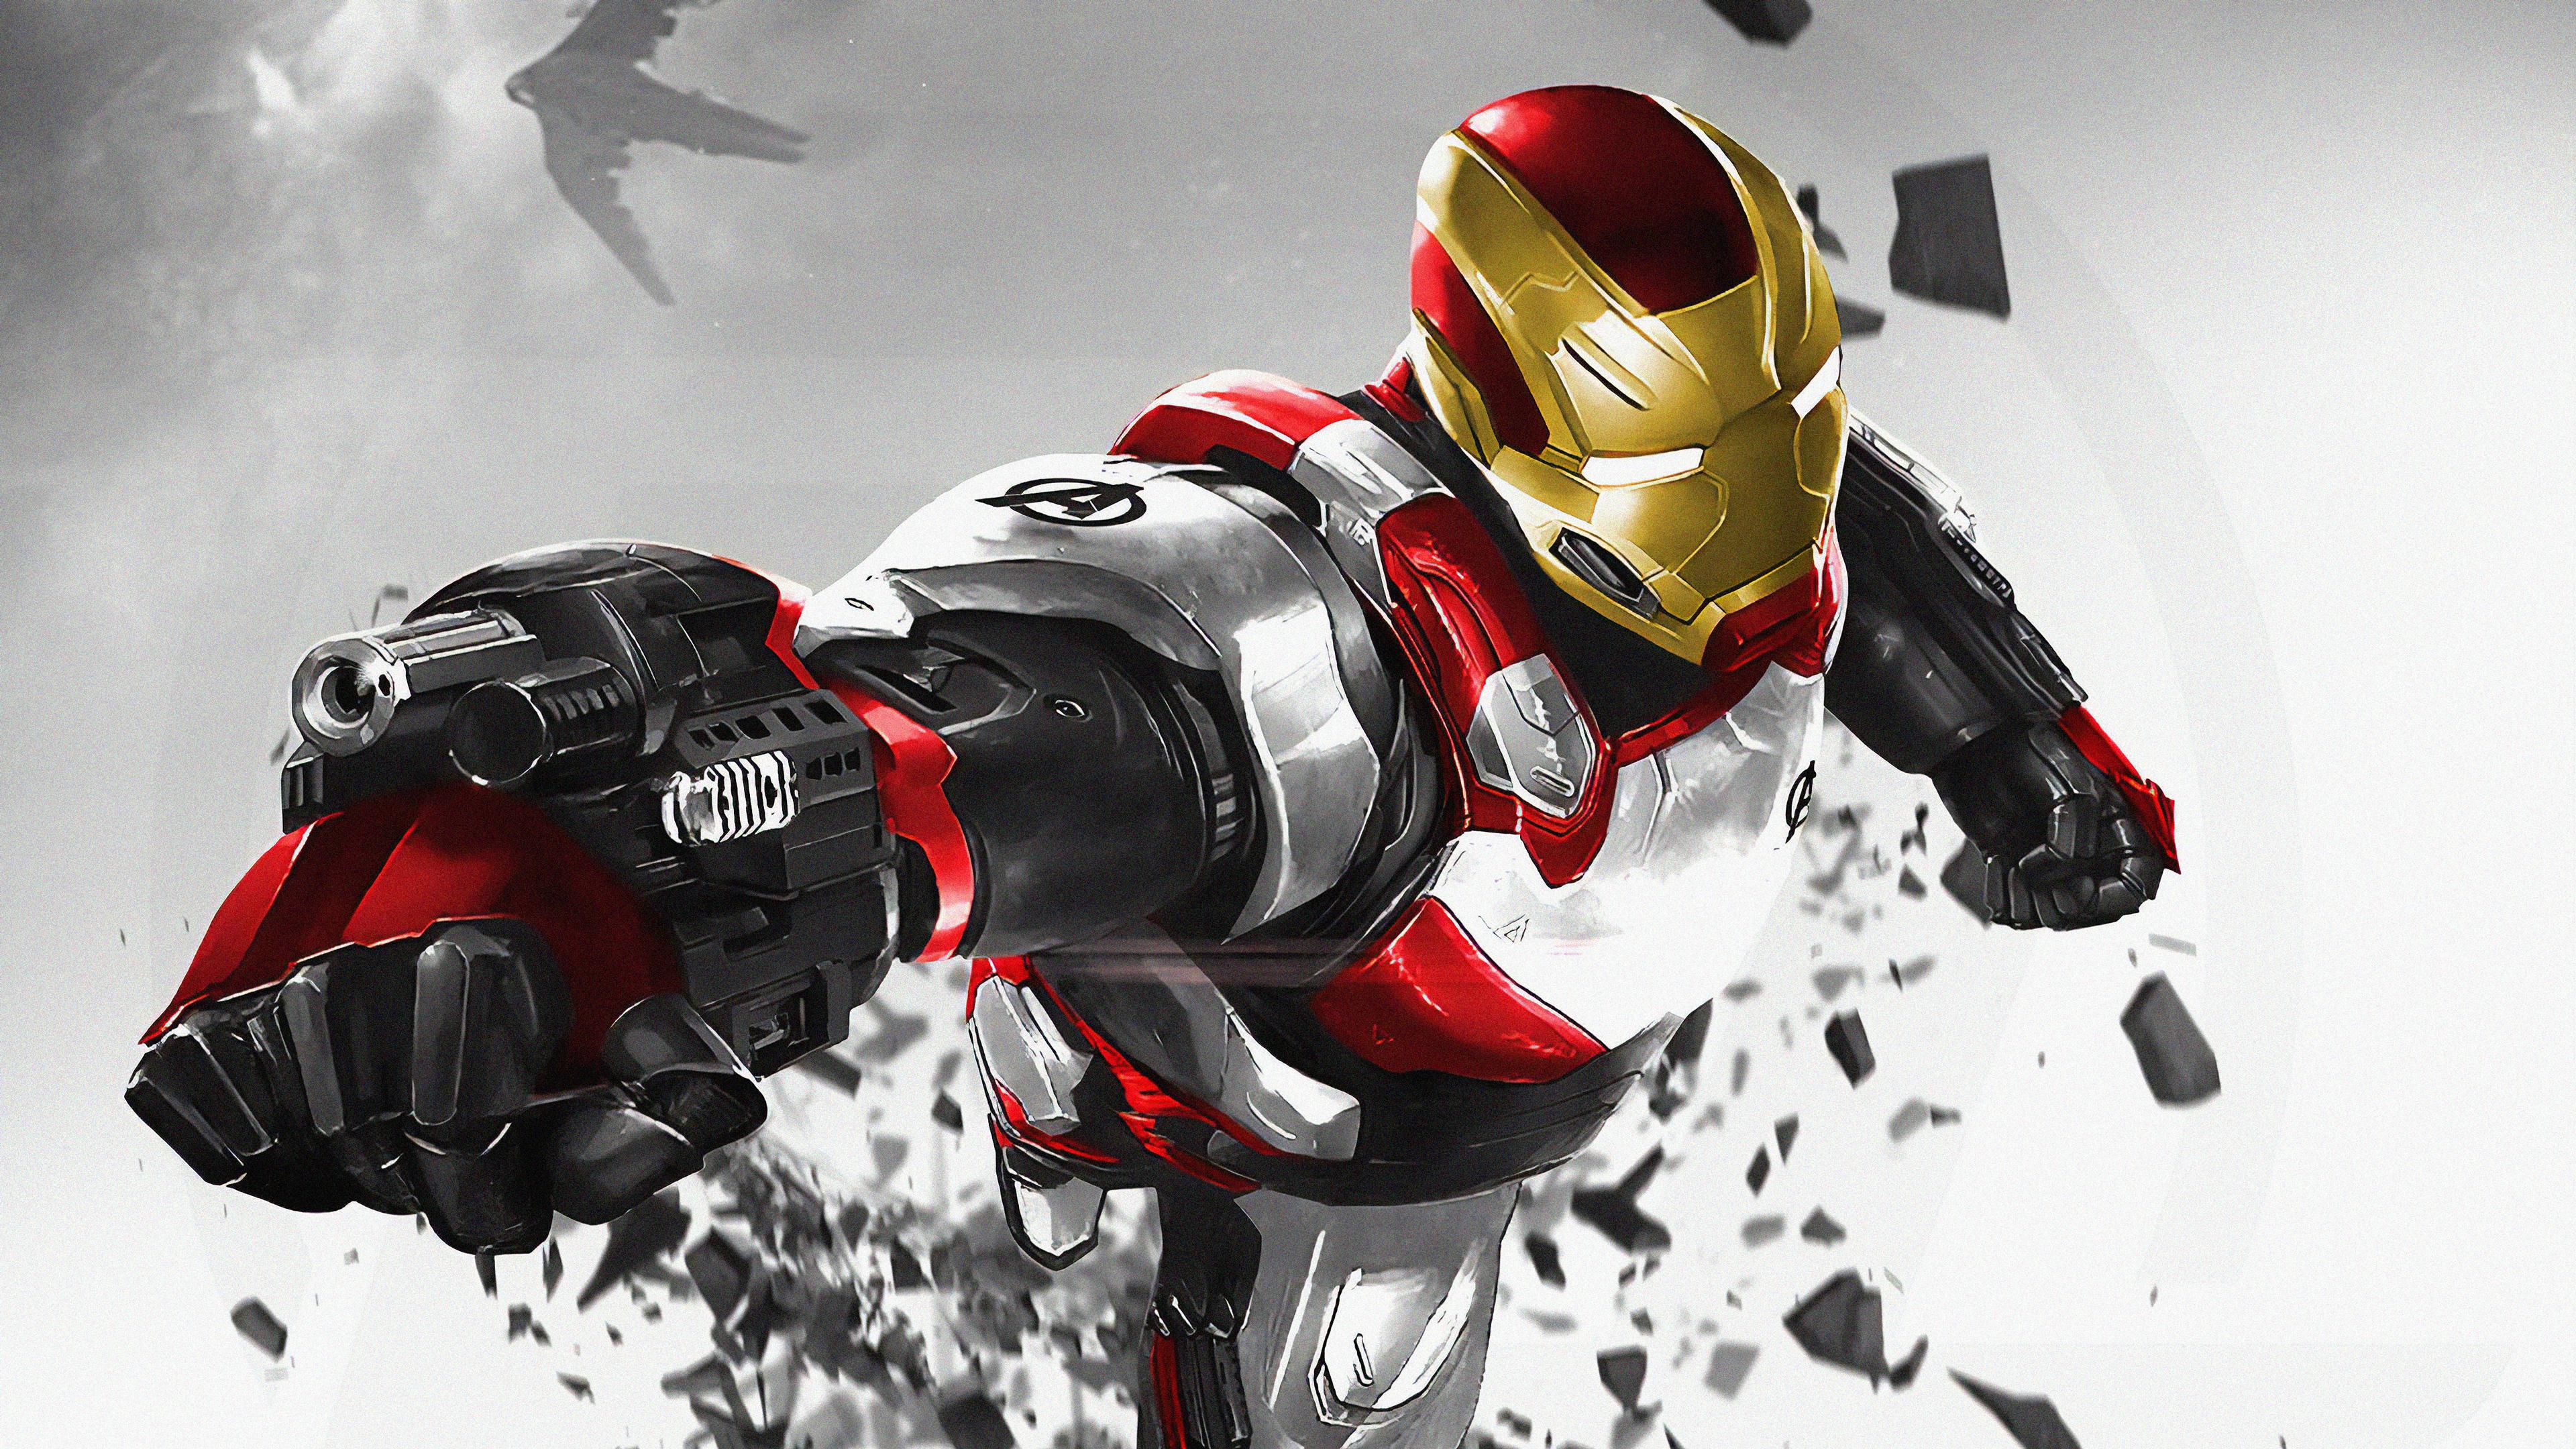 iron man armour 1563219795 - Iron Man Armour - superheroes wallpapers, iron man wallpapers, hd-wallpapers, digital art wallpapers, artwork wallpapers, 4k-wallpapers